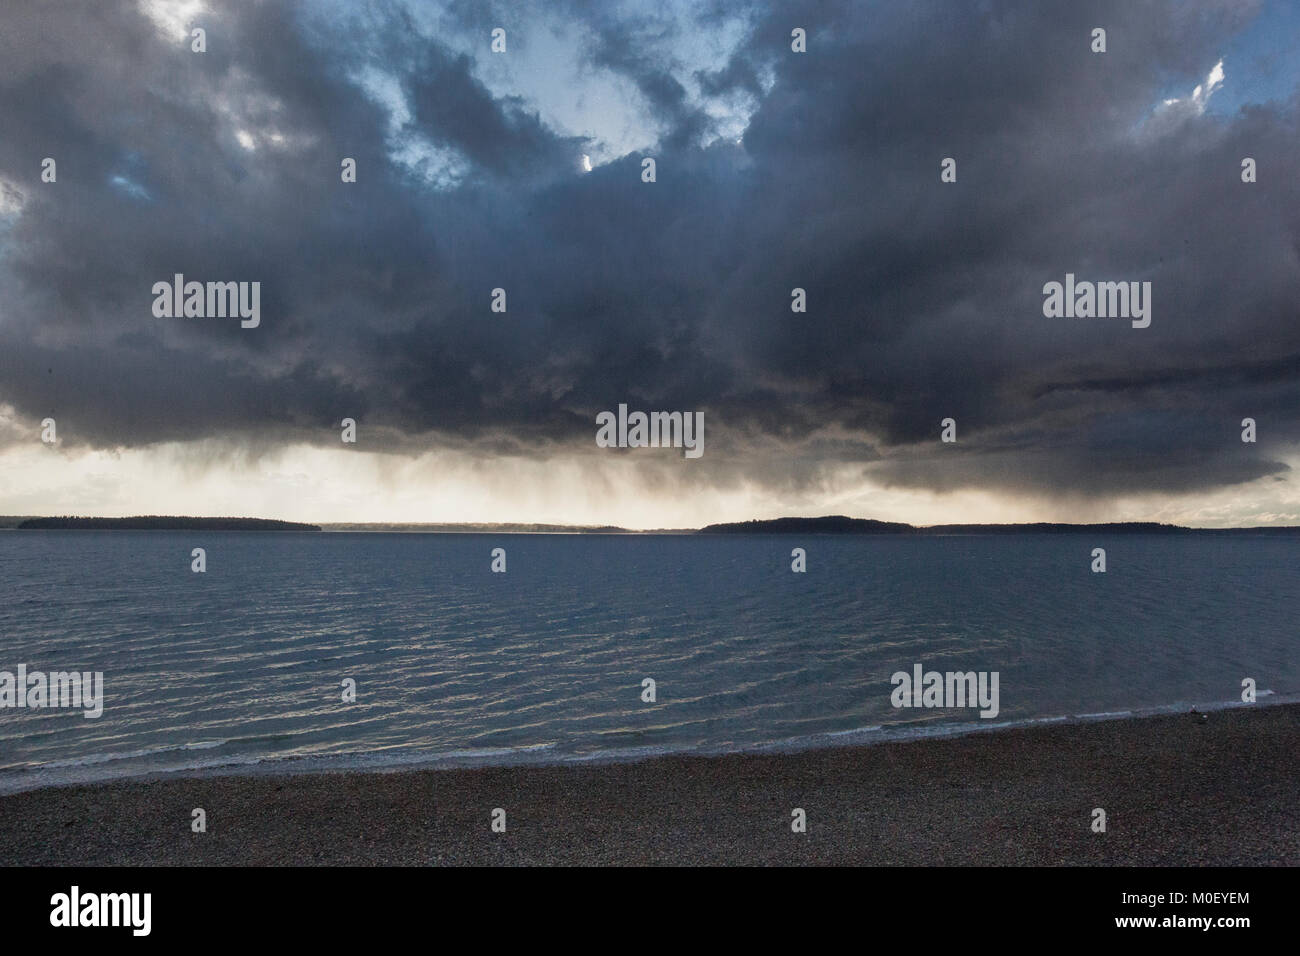 A squall passing over Puget Sound, Washington, USA - Stock Image